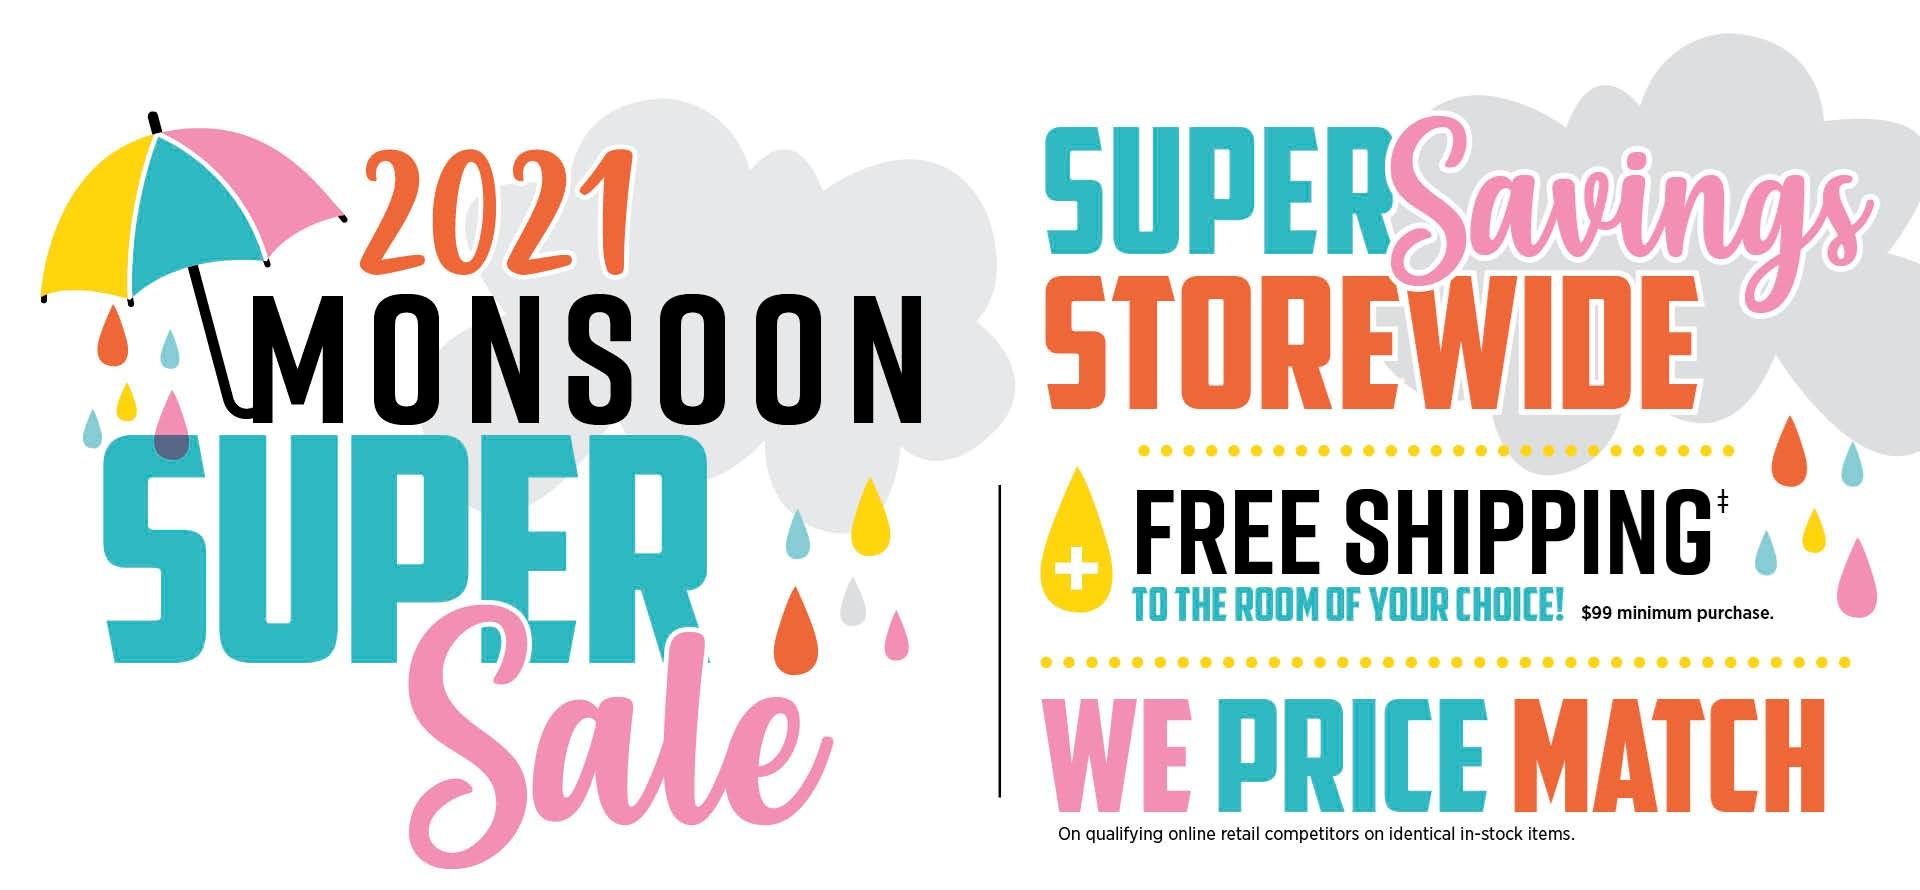 monsoon-super-sale-2021